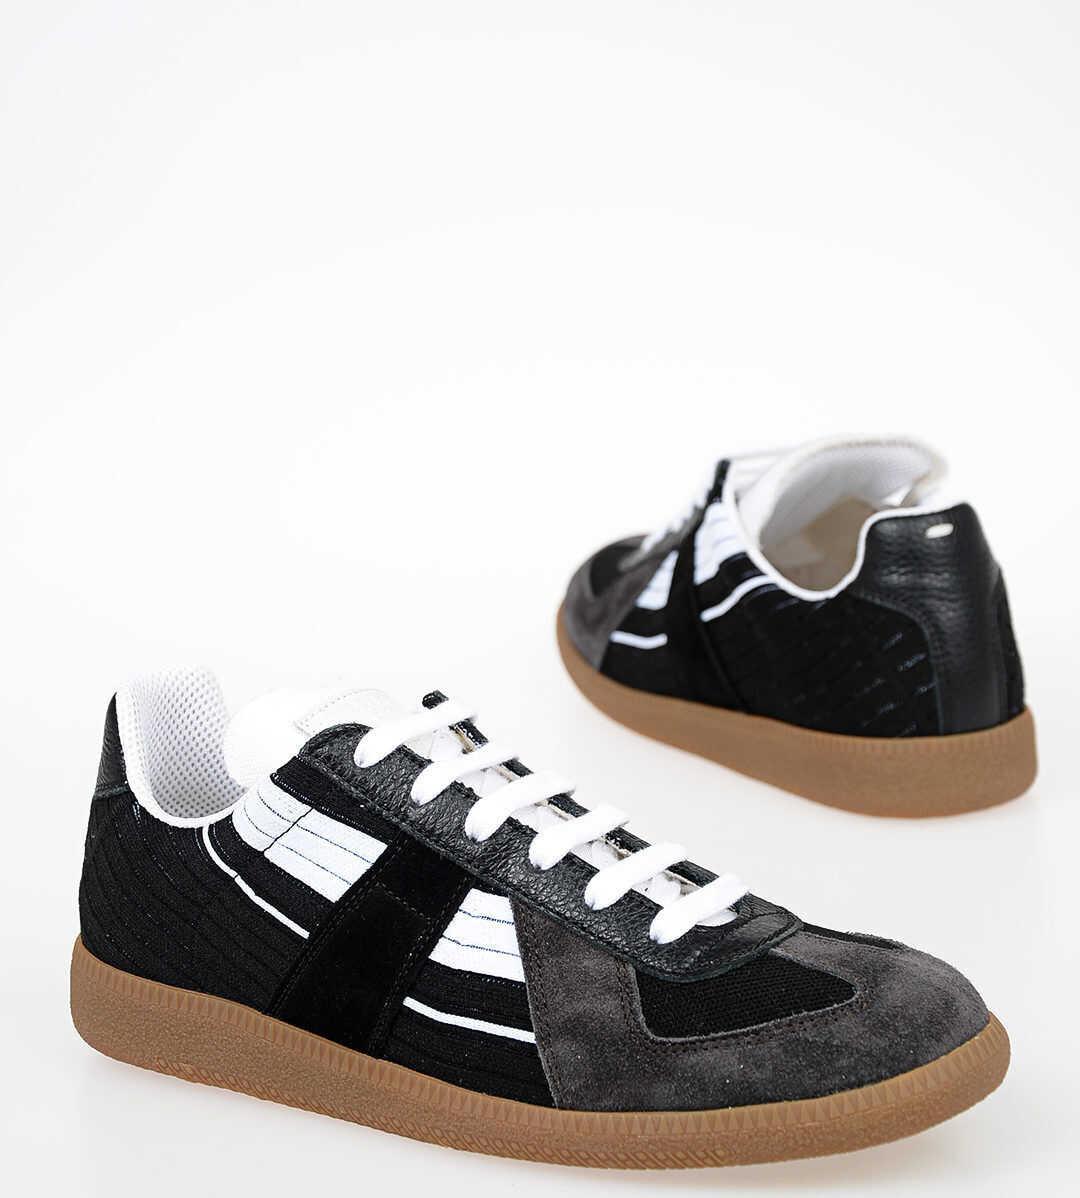 Maison Margiela MM22 Fabric Leather Sneakers MULTICOLOR